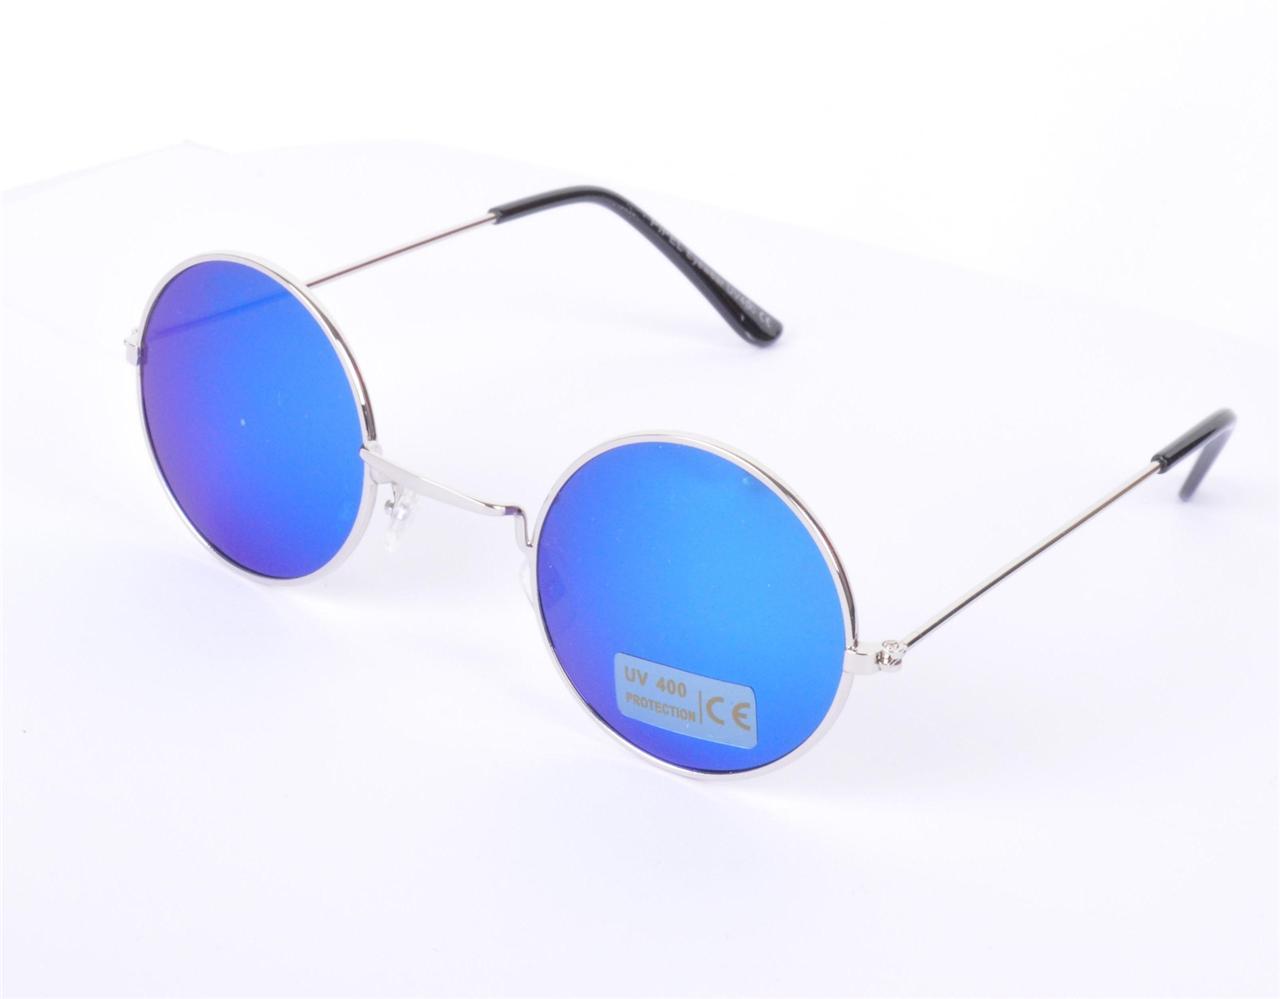 90s Sunglasses  vtg round reflective blue lens 90s john lennon glasses sunglasses